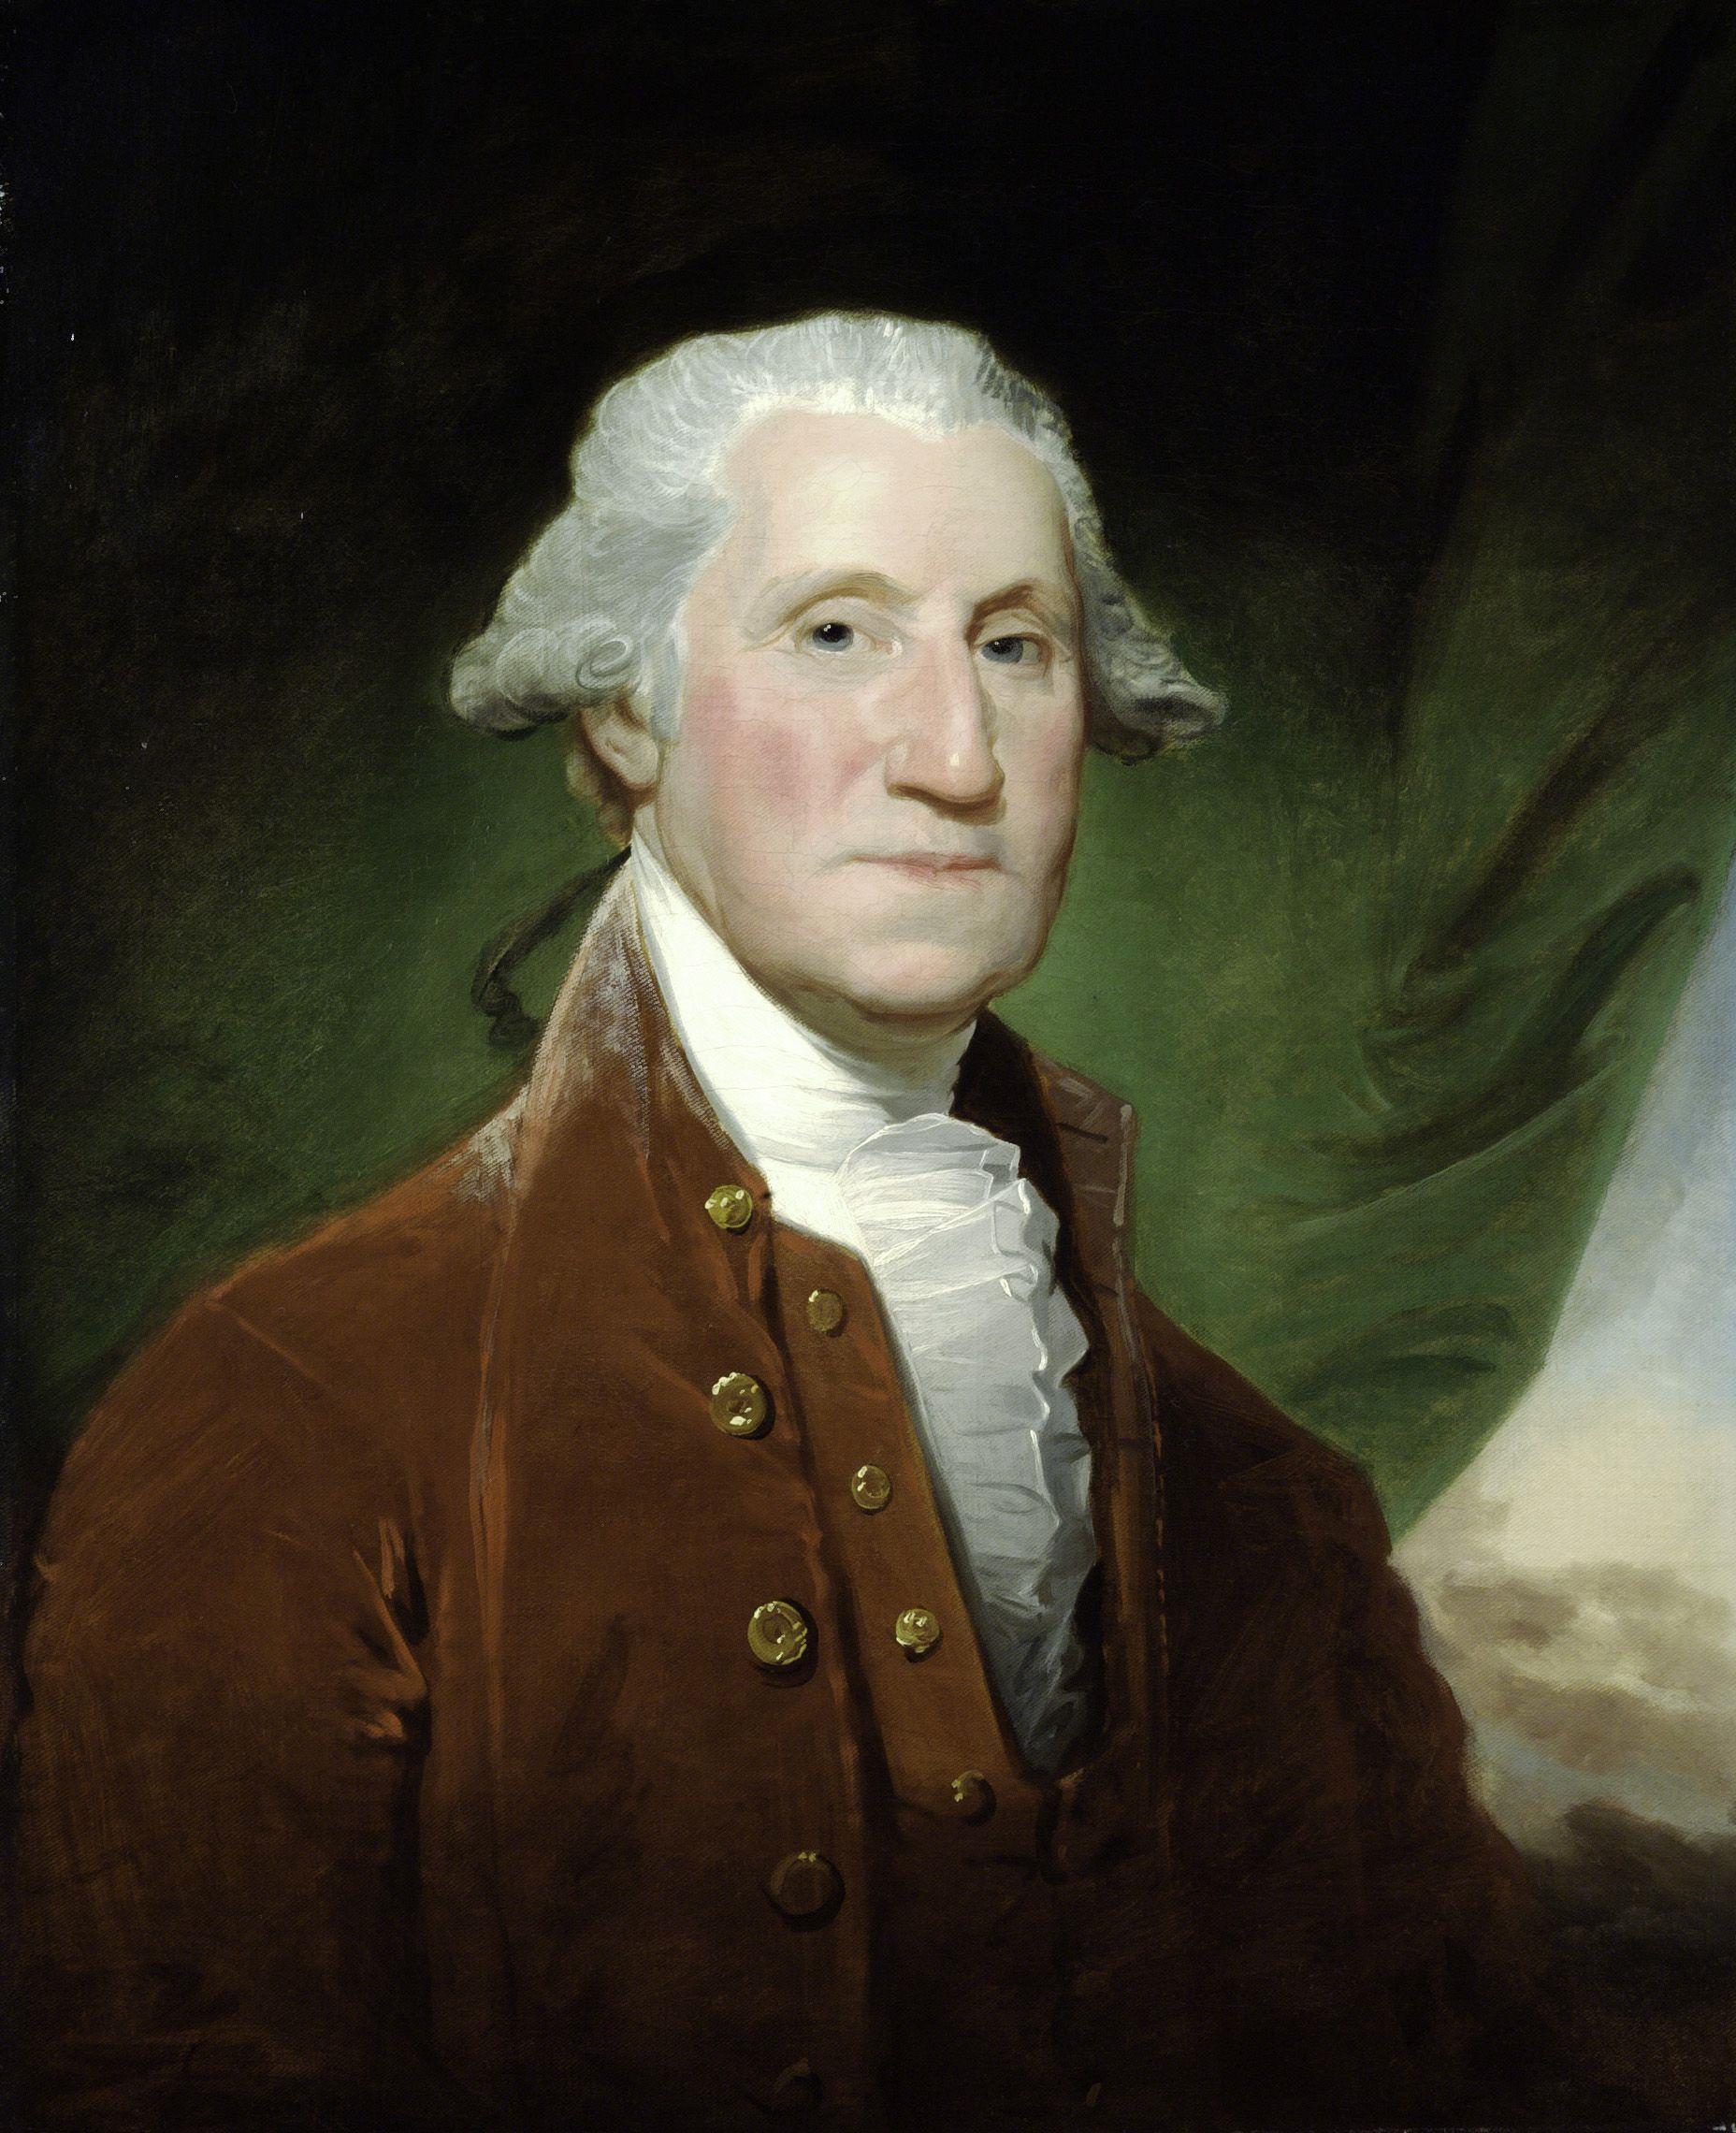 File:George Washington by Gilbert Stuart, 1795-96.png ... George Washington